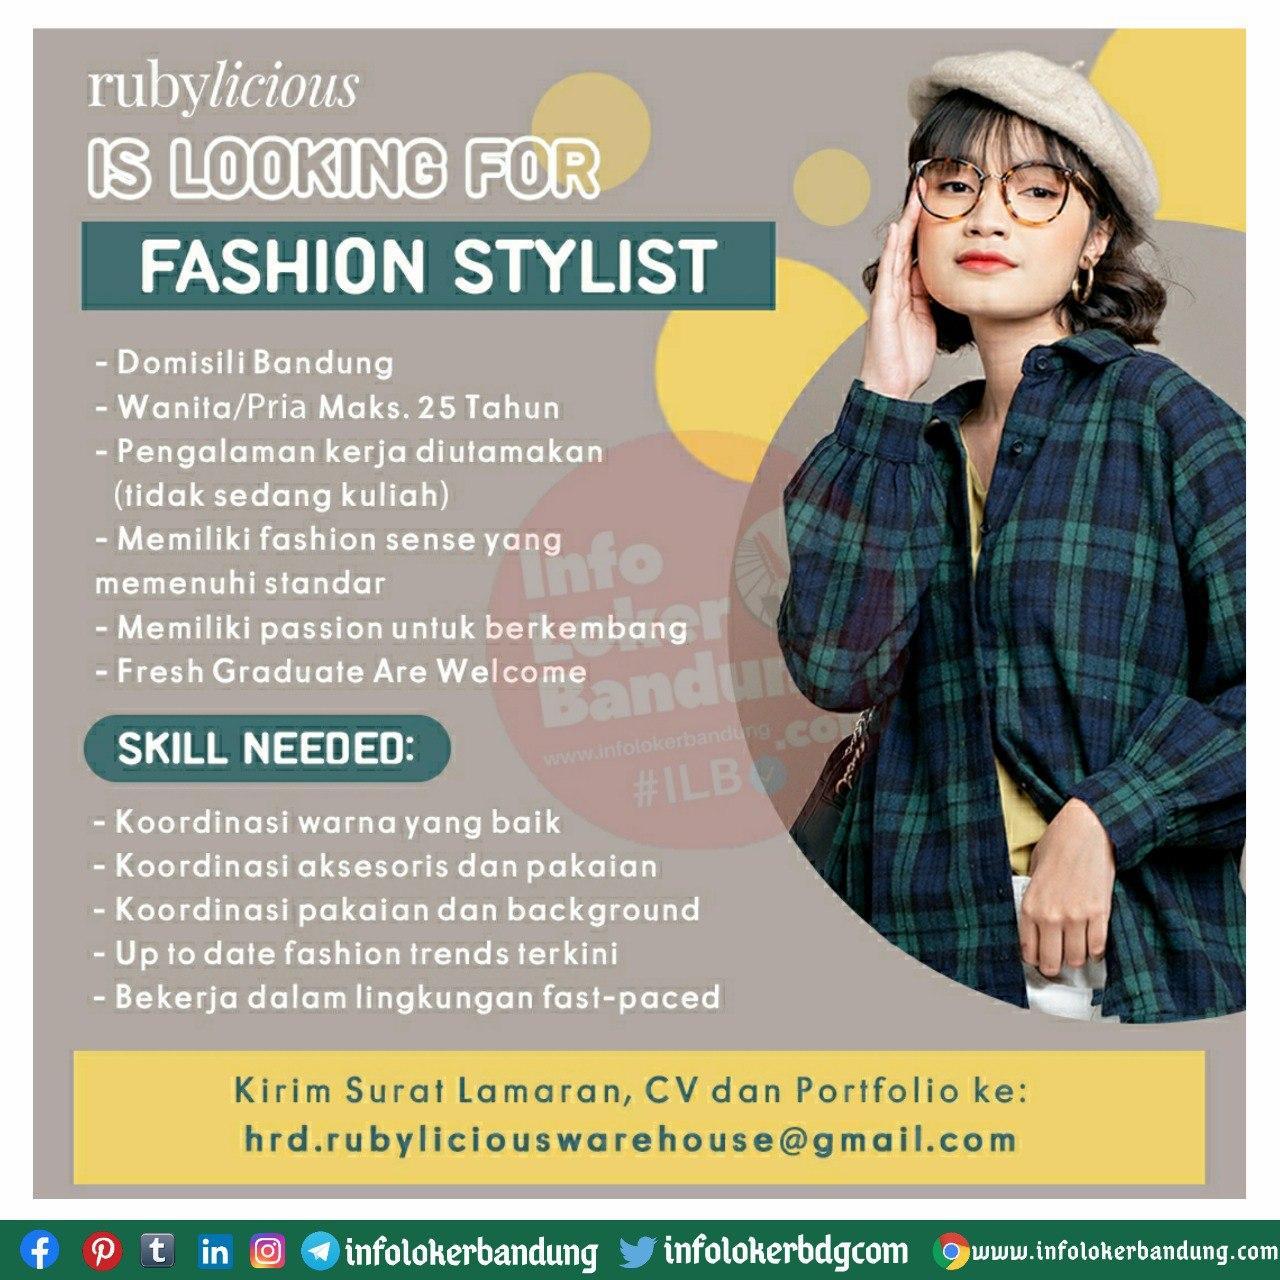 Lowongan Kerja Fashion Stylist Rubylicious Bandung September 2020